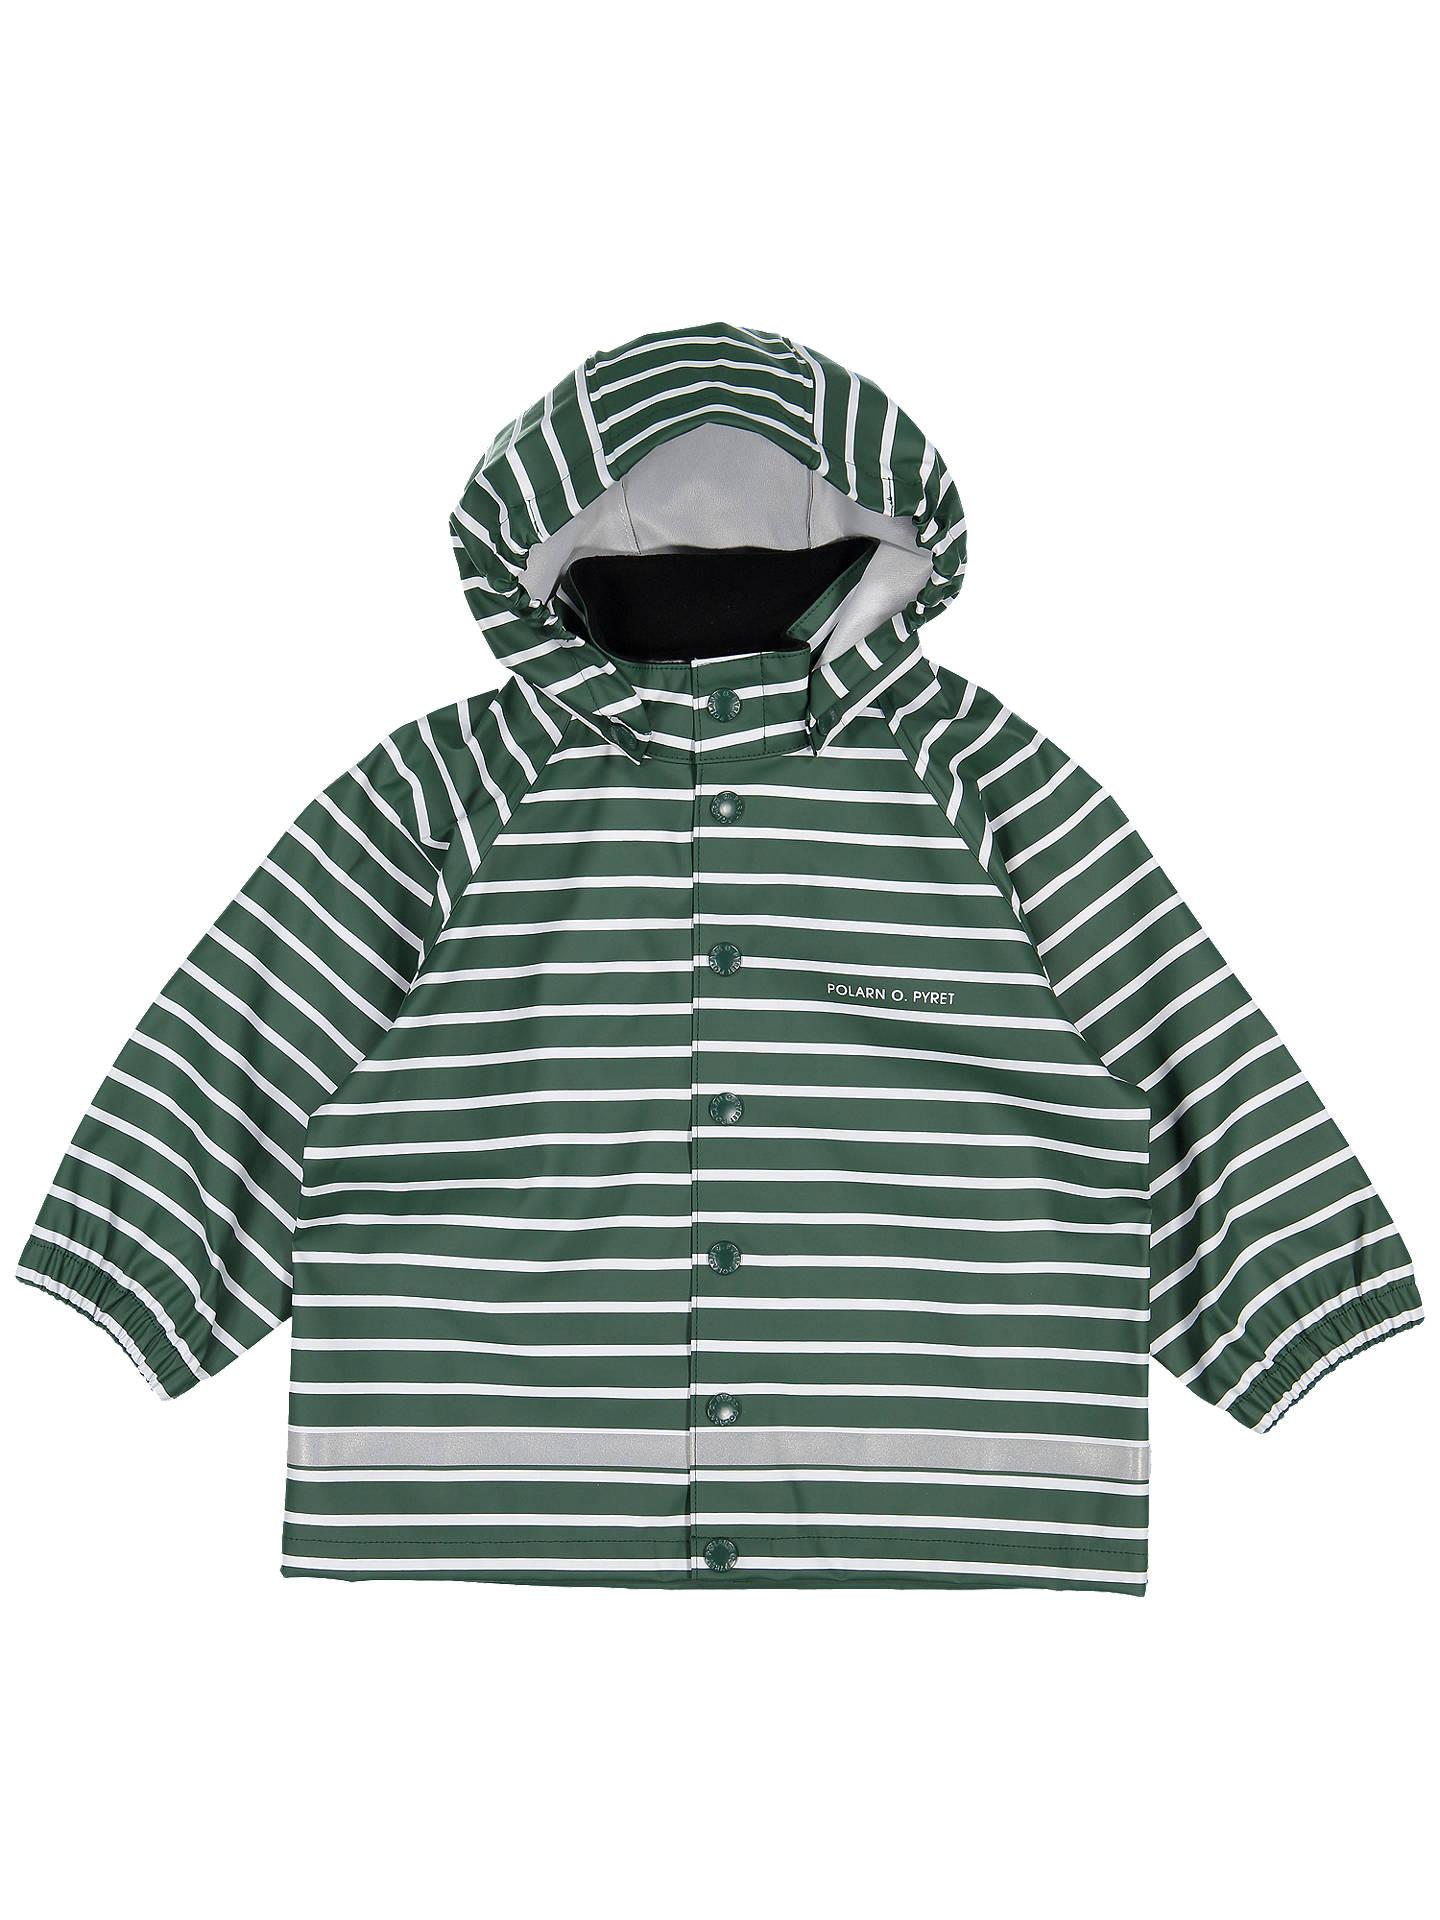 96249043a978 Polarn O. Pyret Baby Rain Jacket